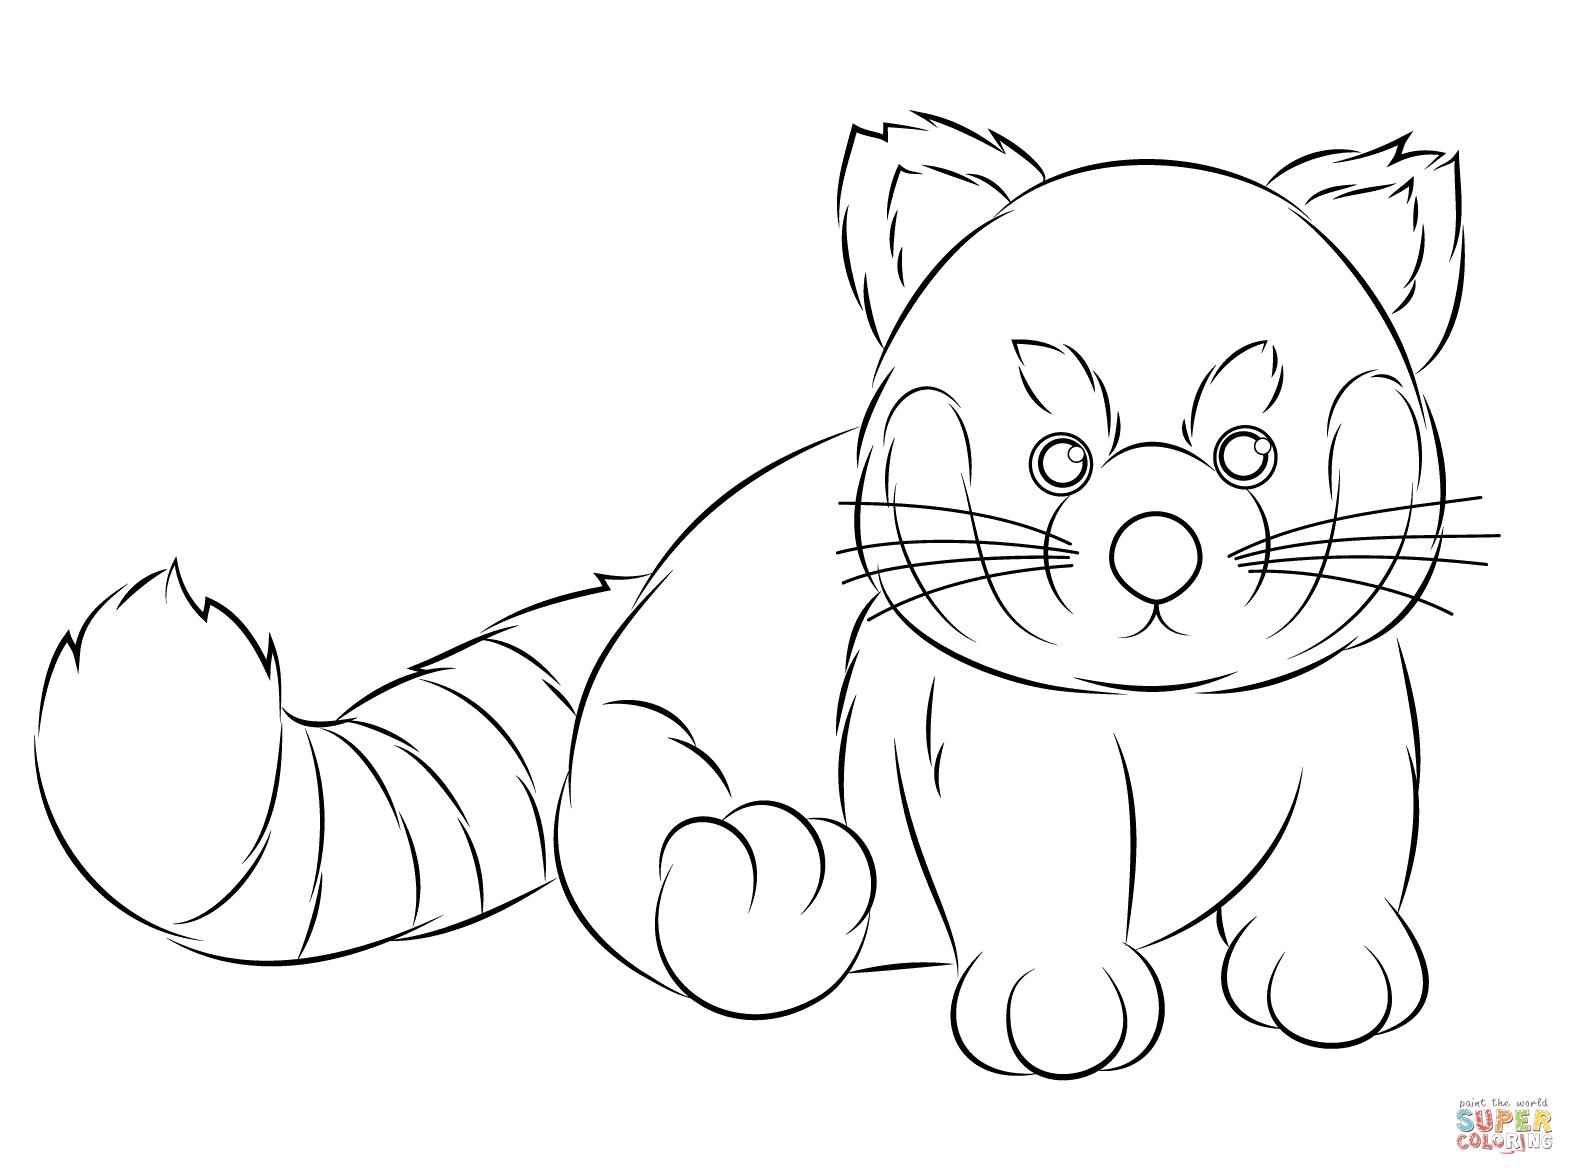 Webkinz Red Panda Coloring Page | Free Printable Coloring intérieur Panda A Colorier